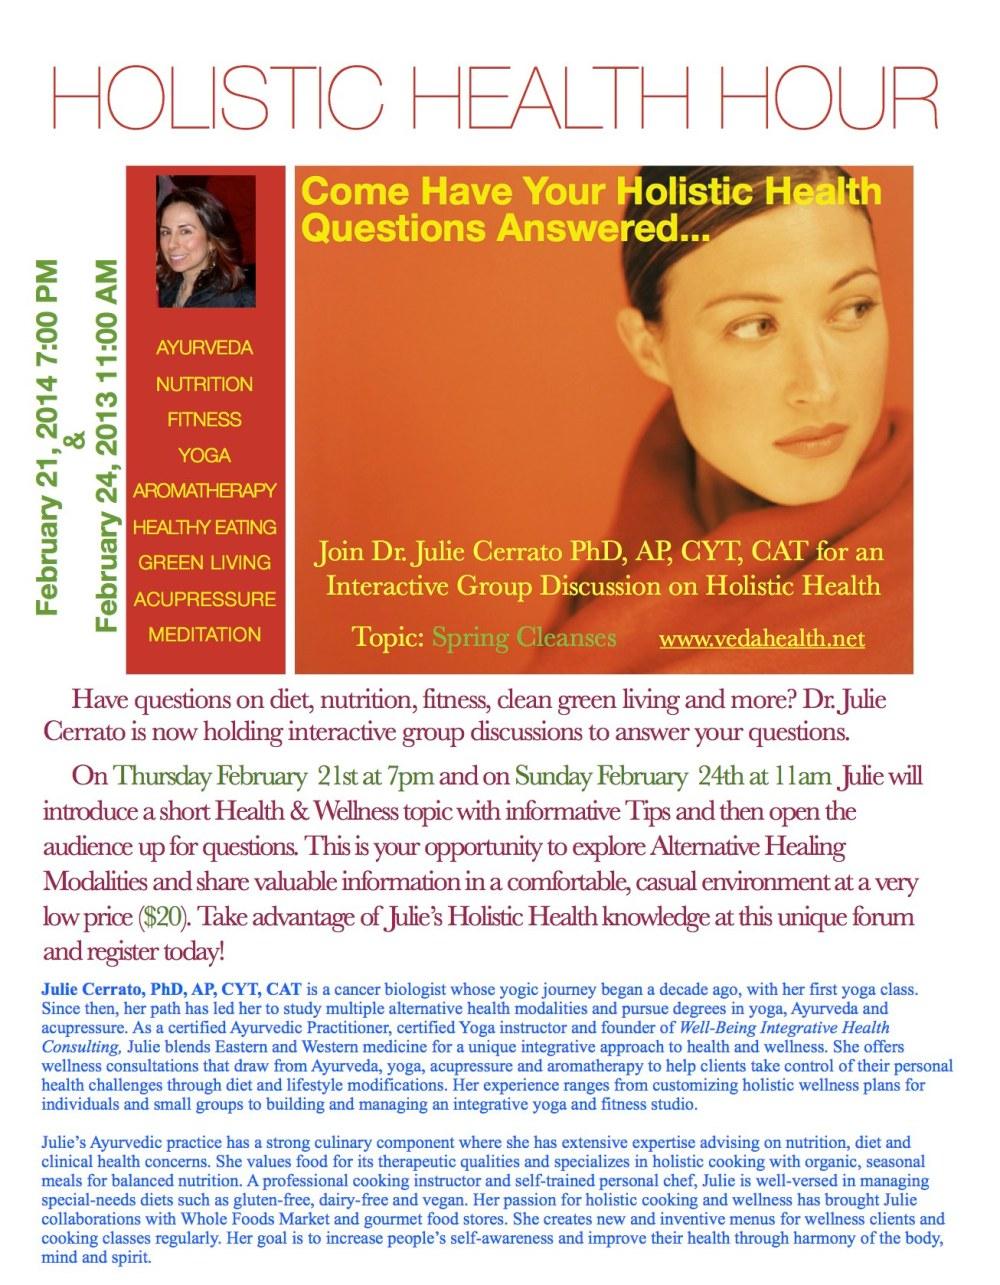 Holistic Health Hour Feb 2013 Photo